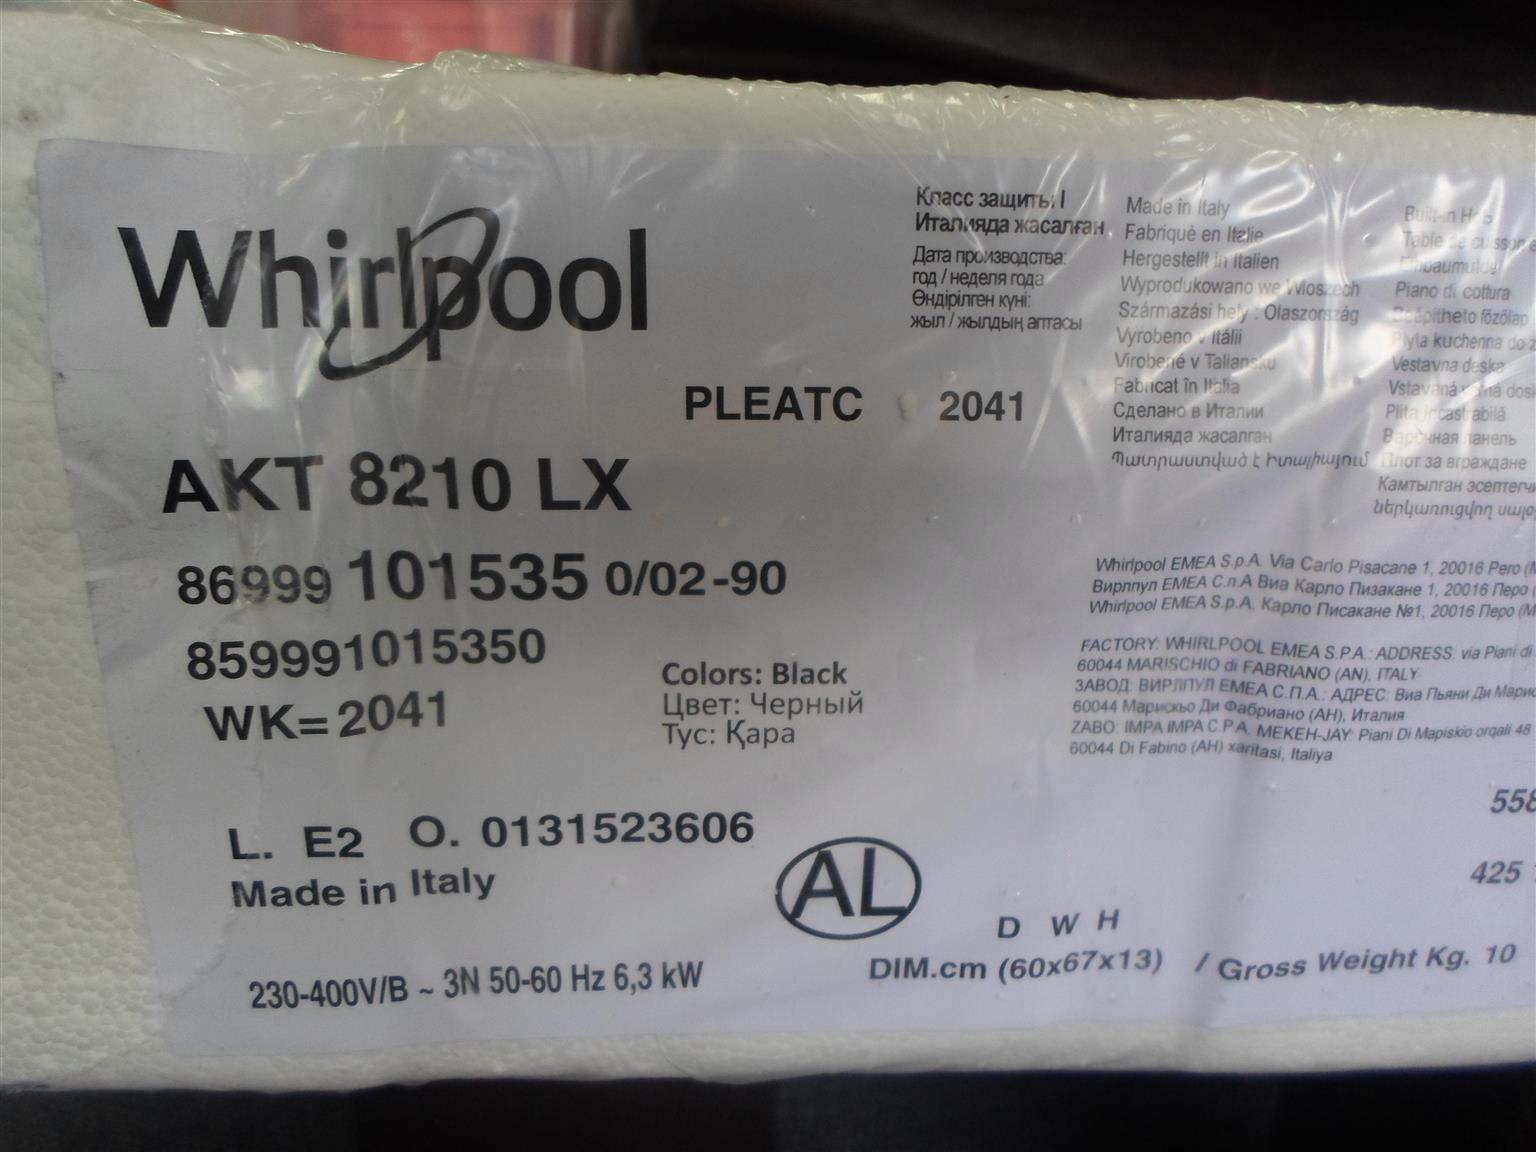 Whirlpool AKT 8210 LX Stove